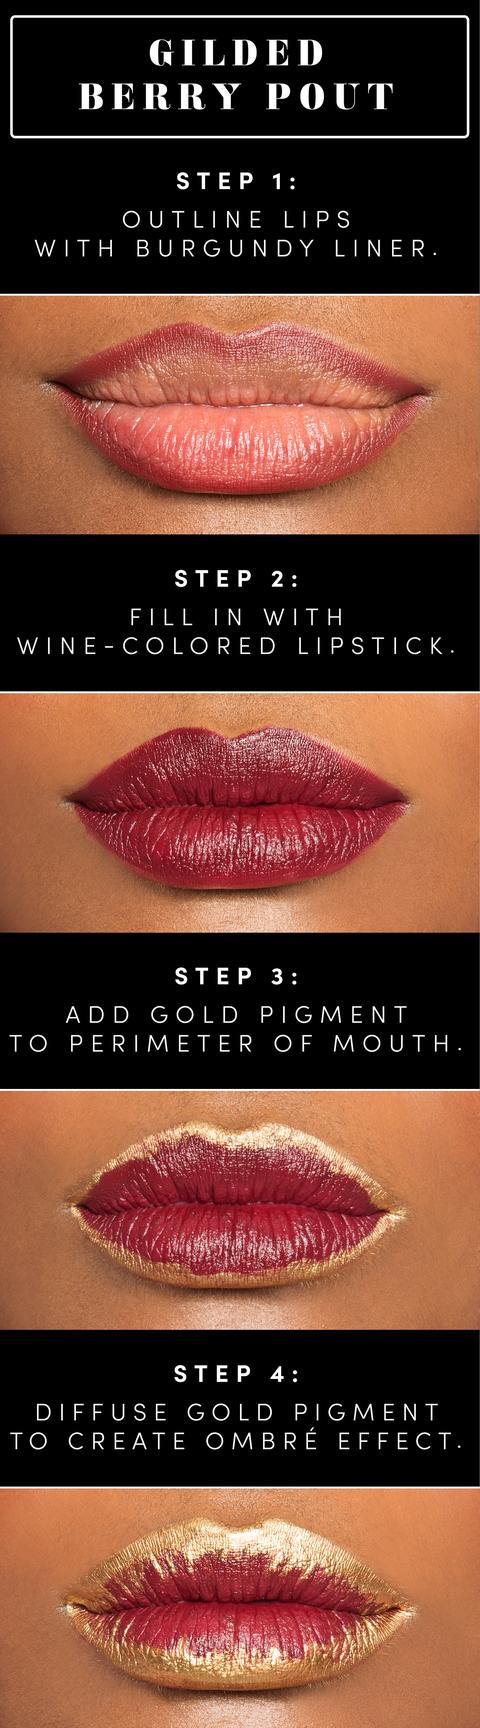 Mac Cosmetics Red Lip Kits The Saem Woo Eyebrow Brown 01 Image